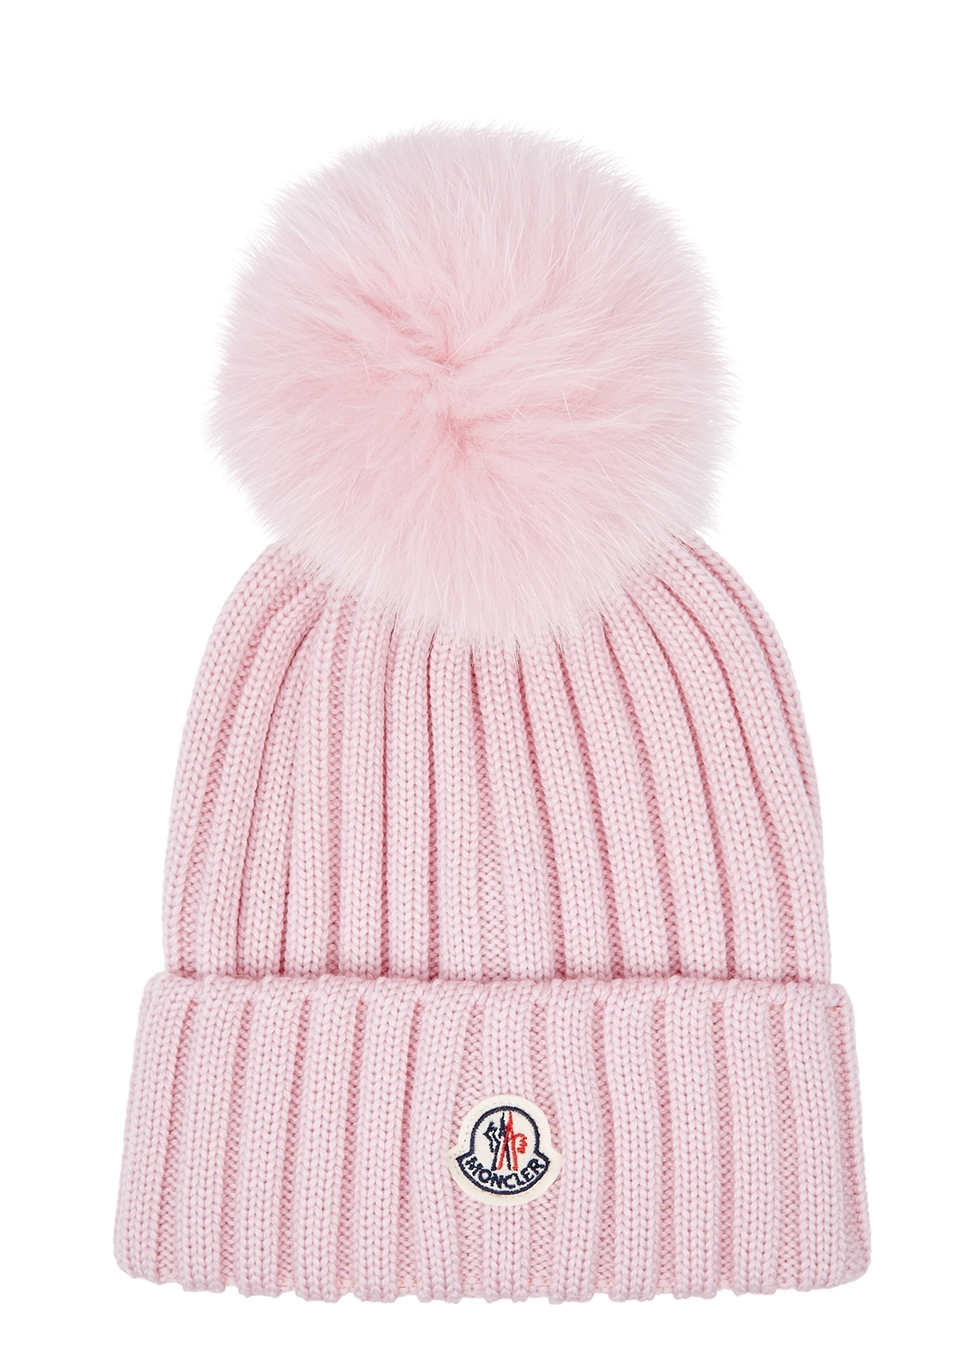 a03c75b35be Designer Beanies - Women s Luxury Hats - Harvey Nichols